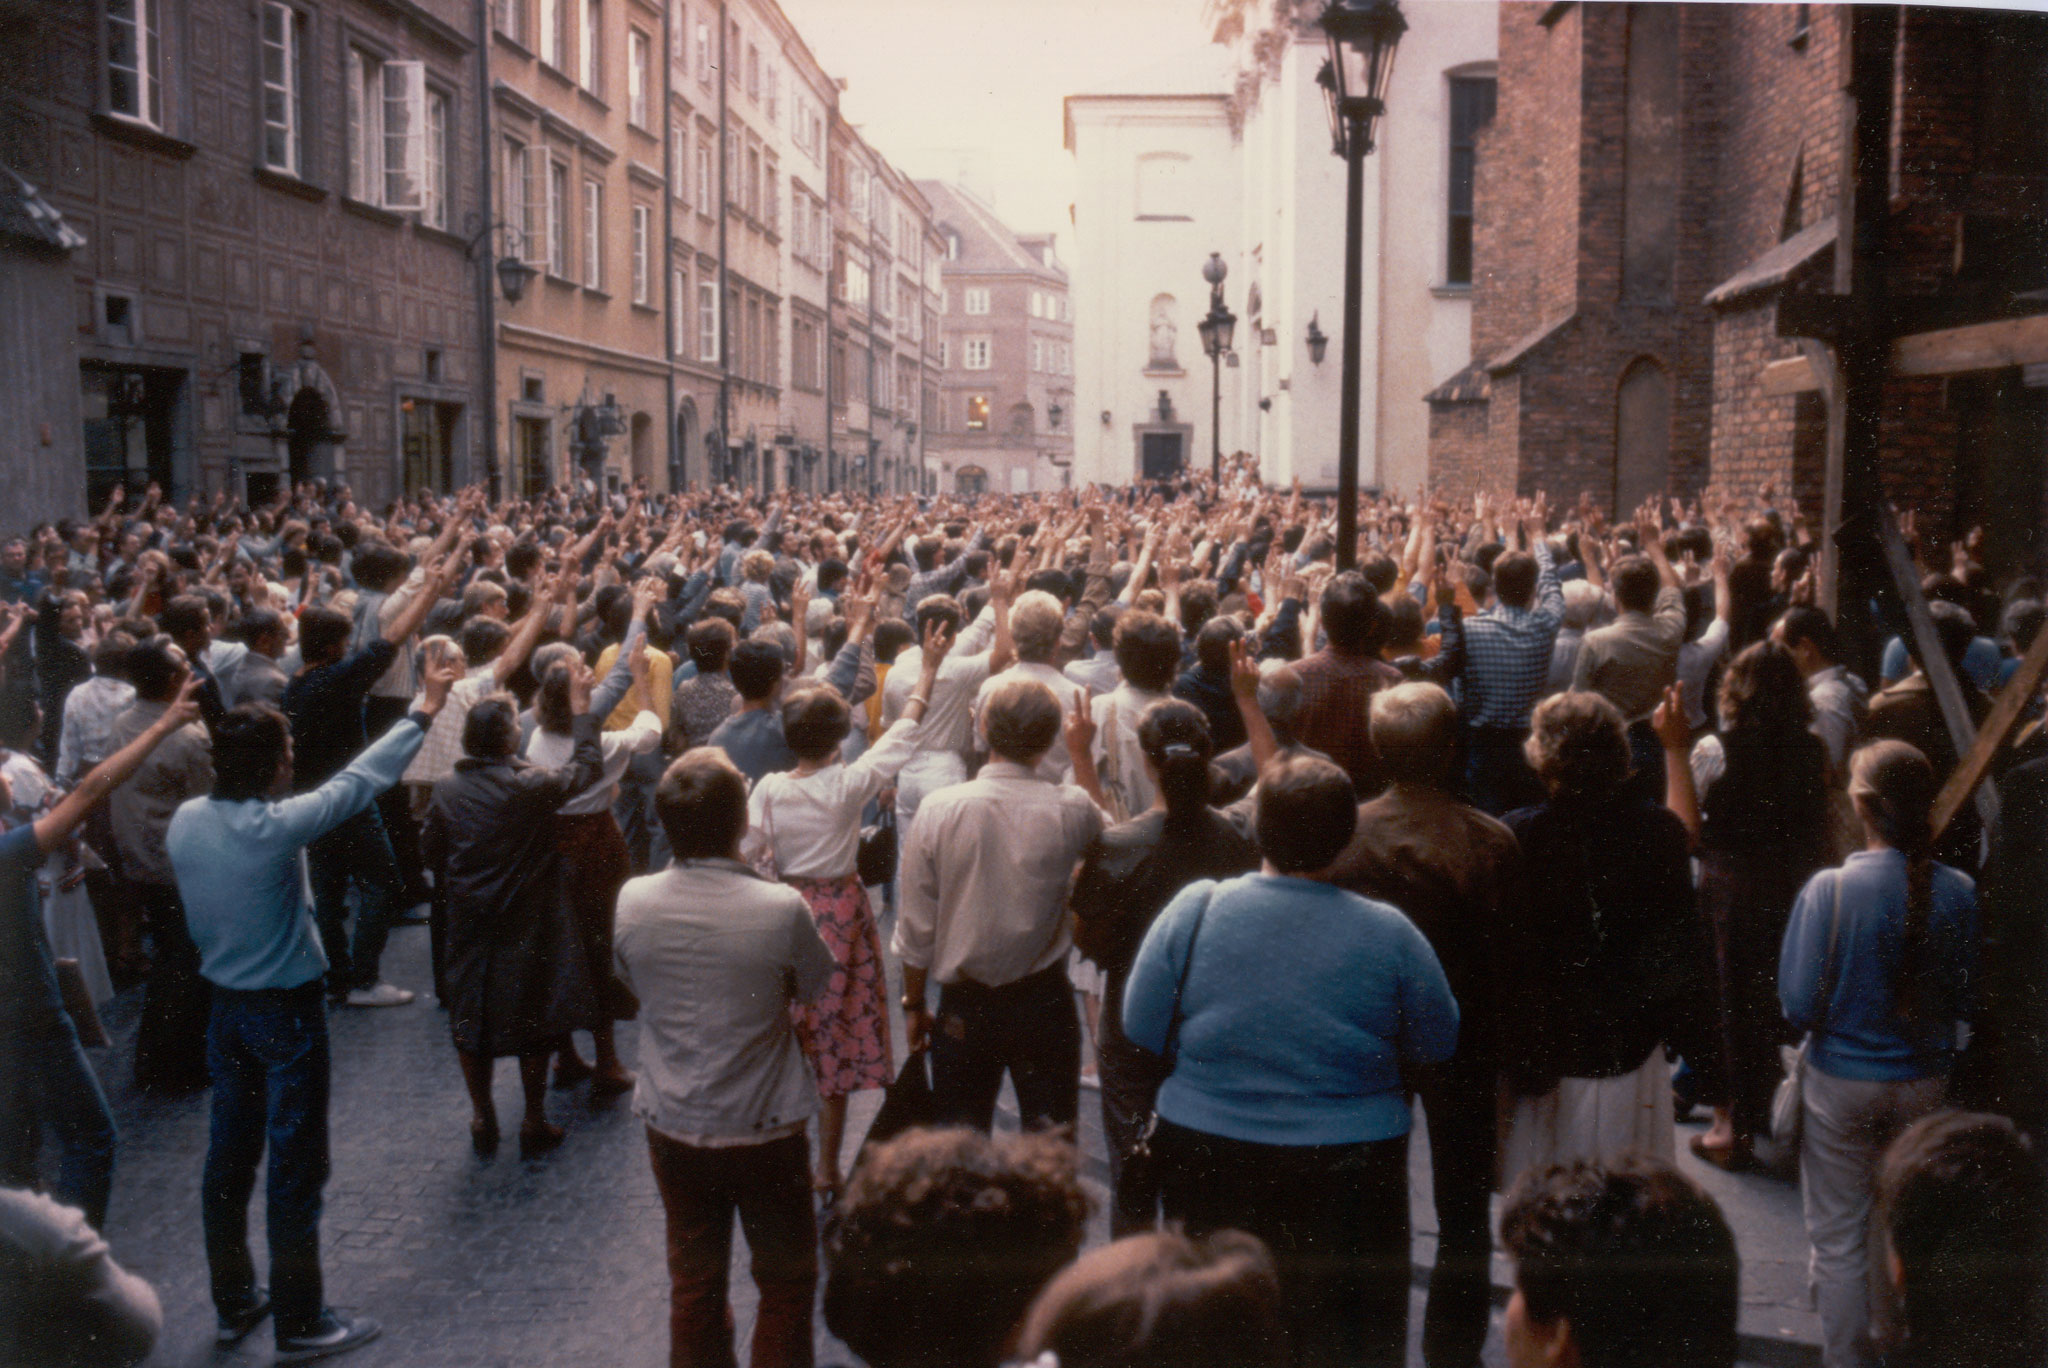 Solidarity_1984_August_31